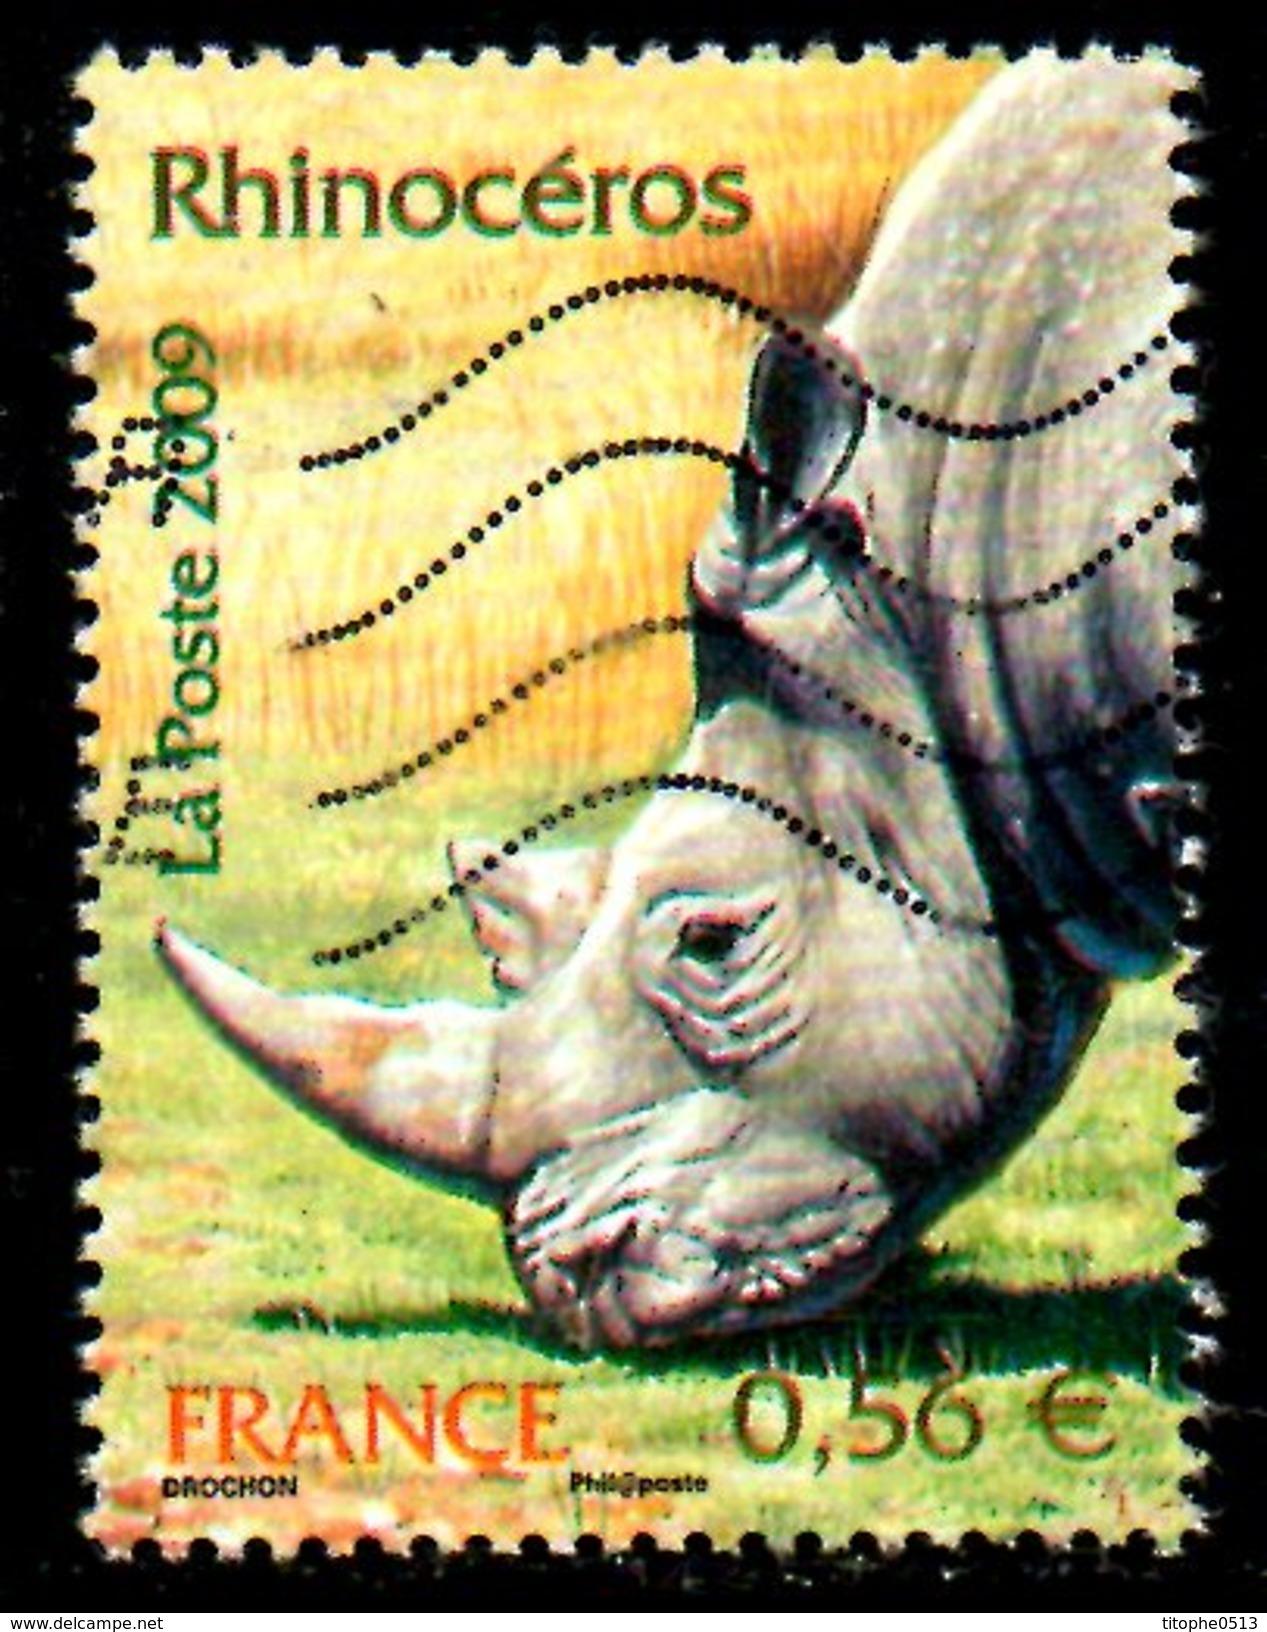 FRANCE. N°4373 De 2009 Oblitéré. Rhinocéros. - Rhinozerosse